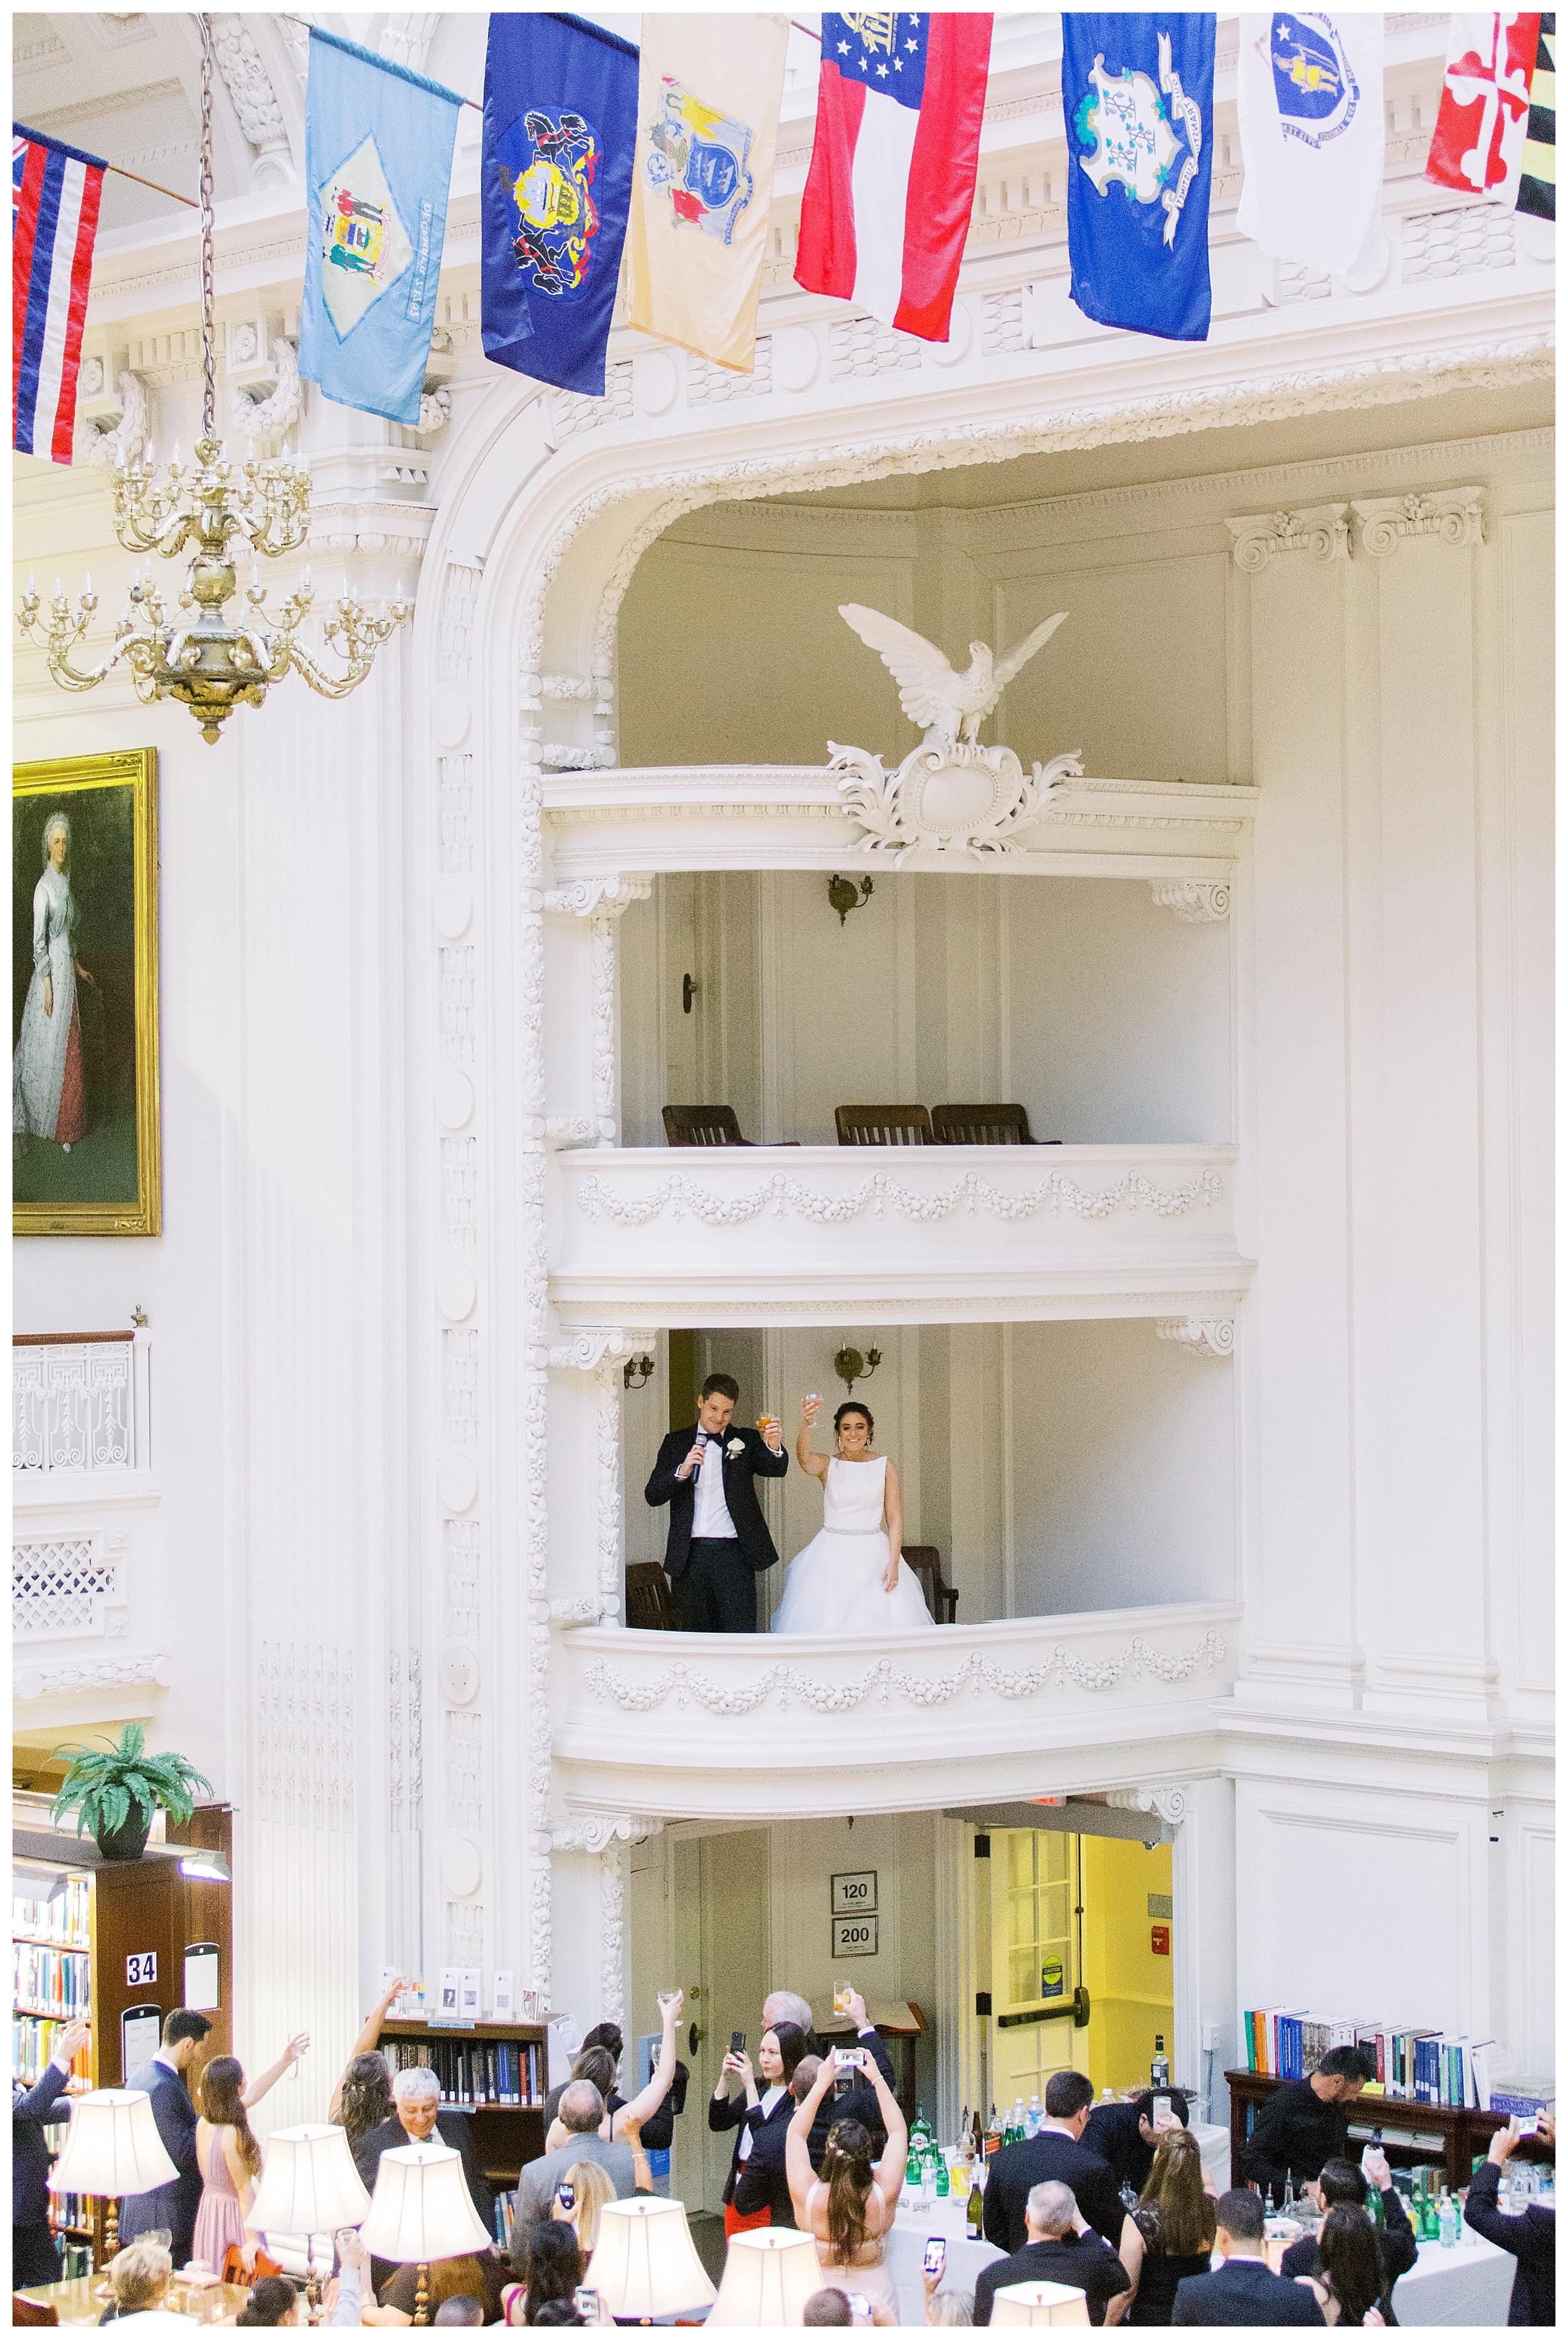 DAR Constitution Hall Wedding Wedding | Daughters of the American Revolution Wedding | District of Columbia Film Wedding Photographer Kir Tuben_0130.jpg